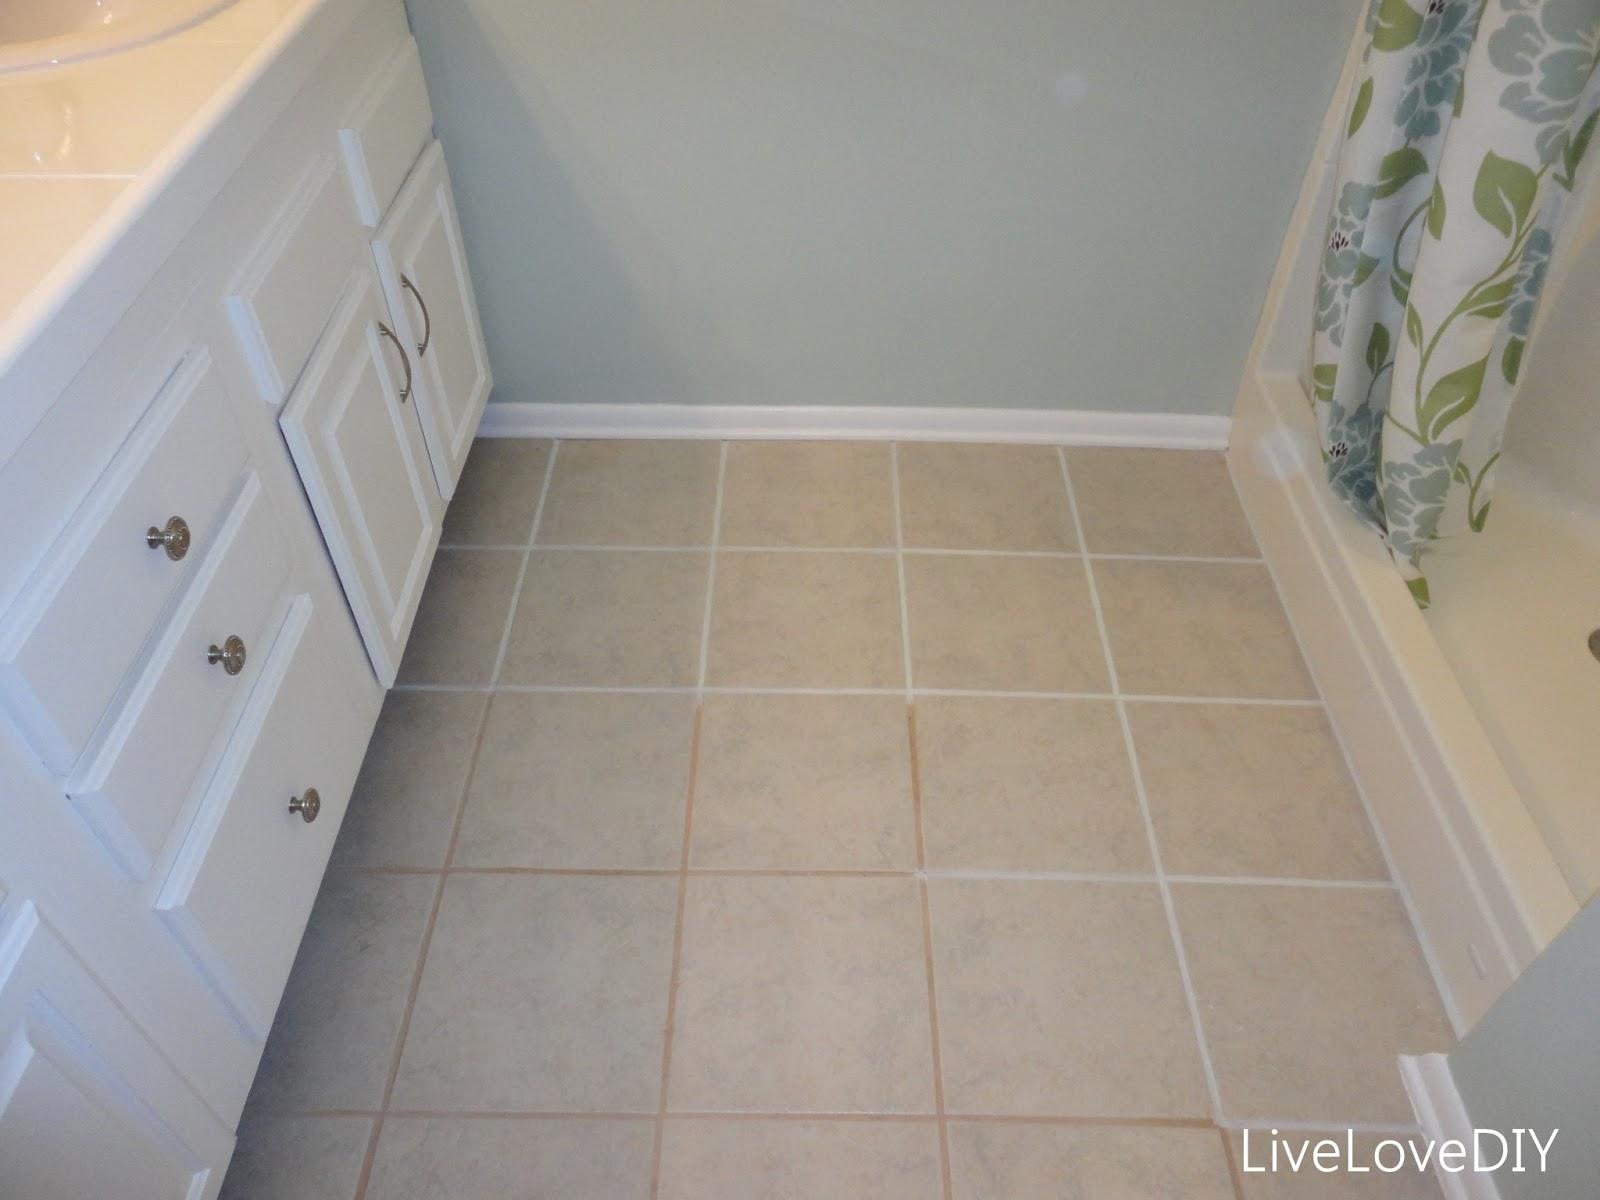 Paint old tile bathroom - Paint Old Tile Bathroom 38